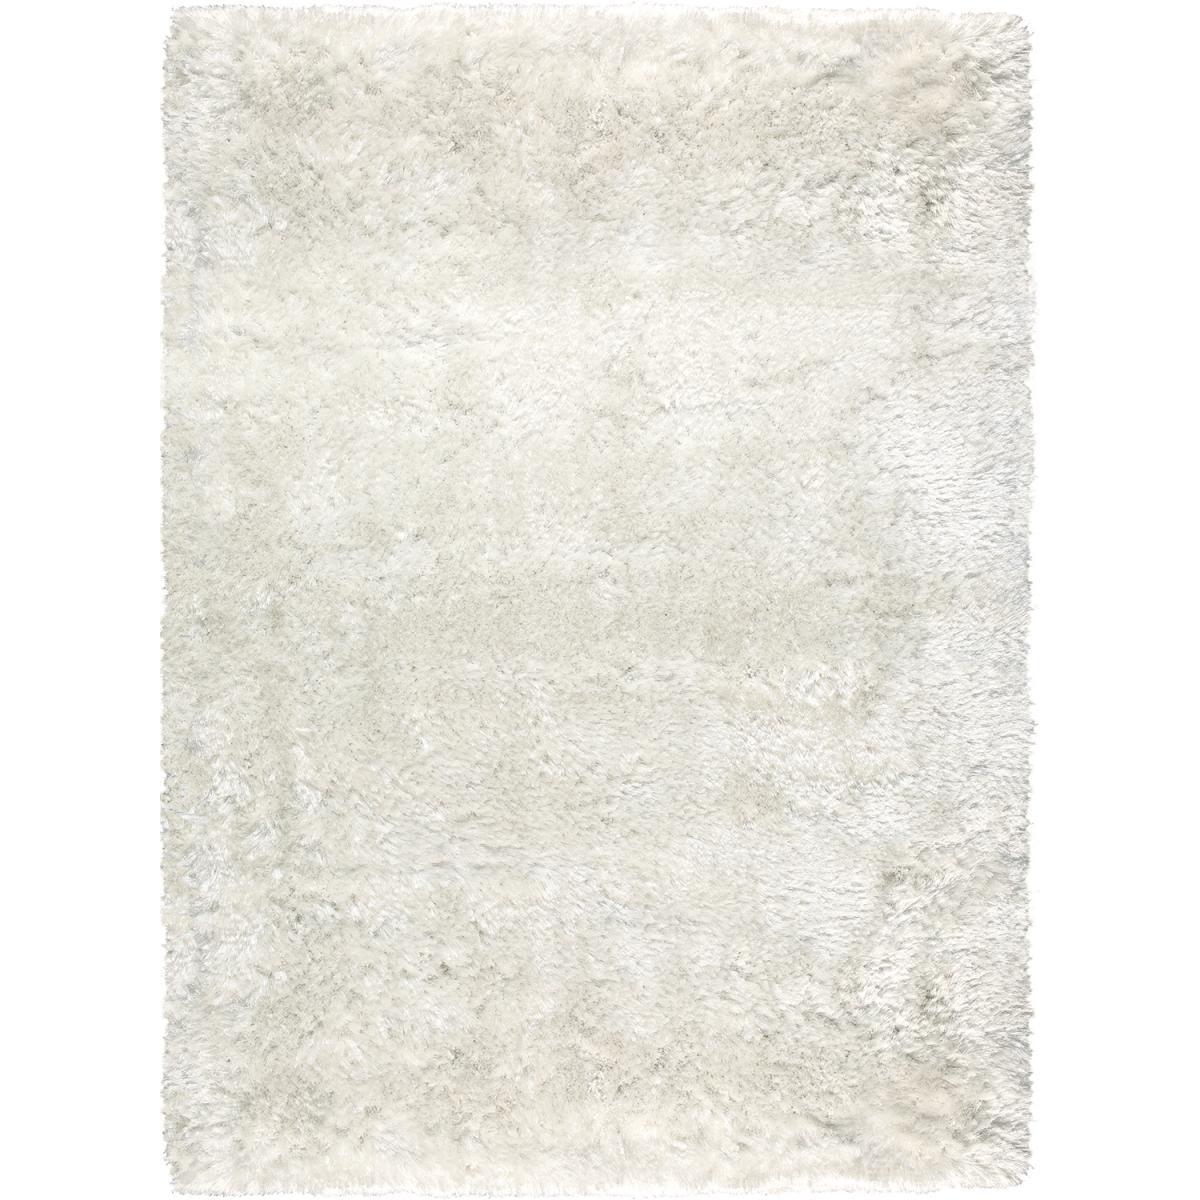 Tapis shaggy poils long en polyester blanc 200x300